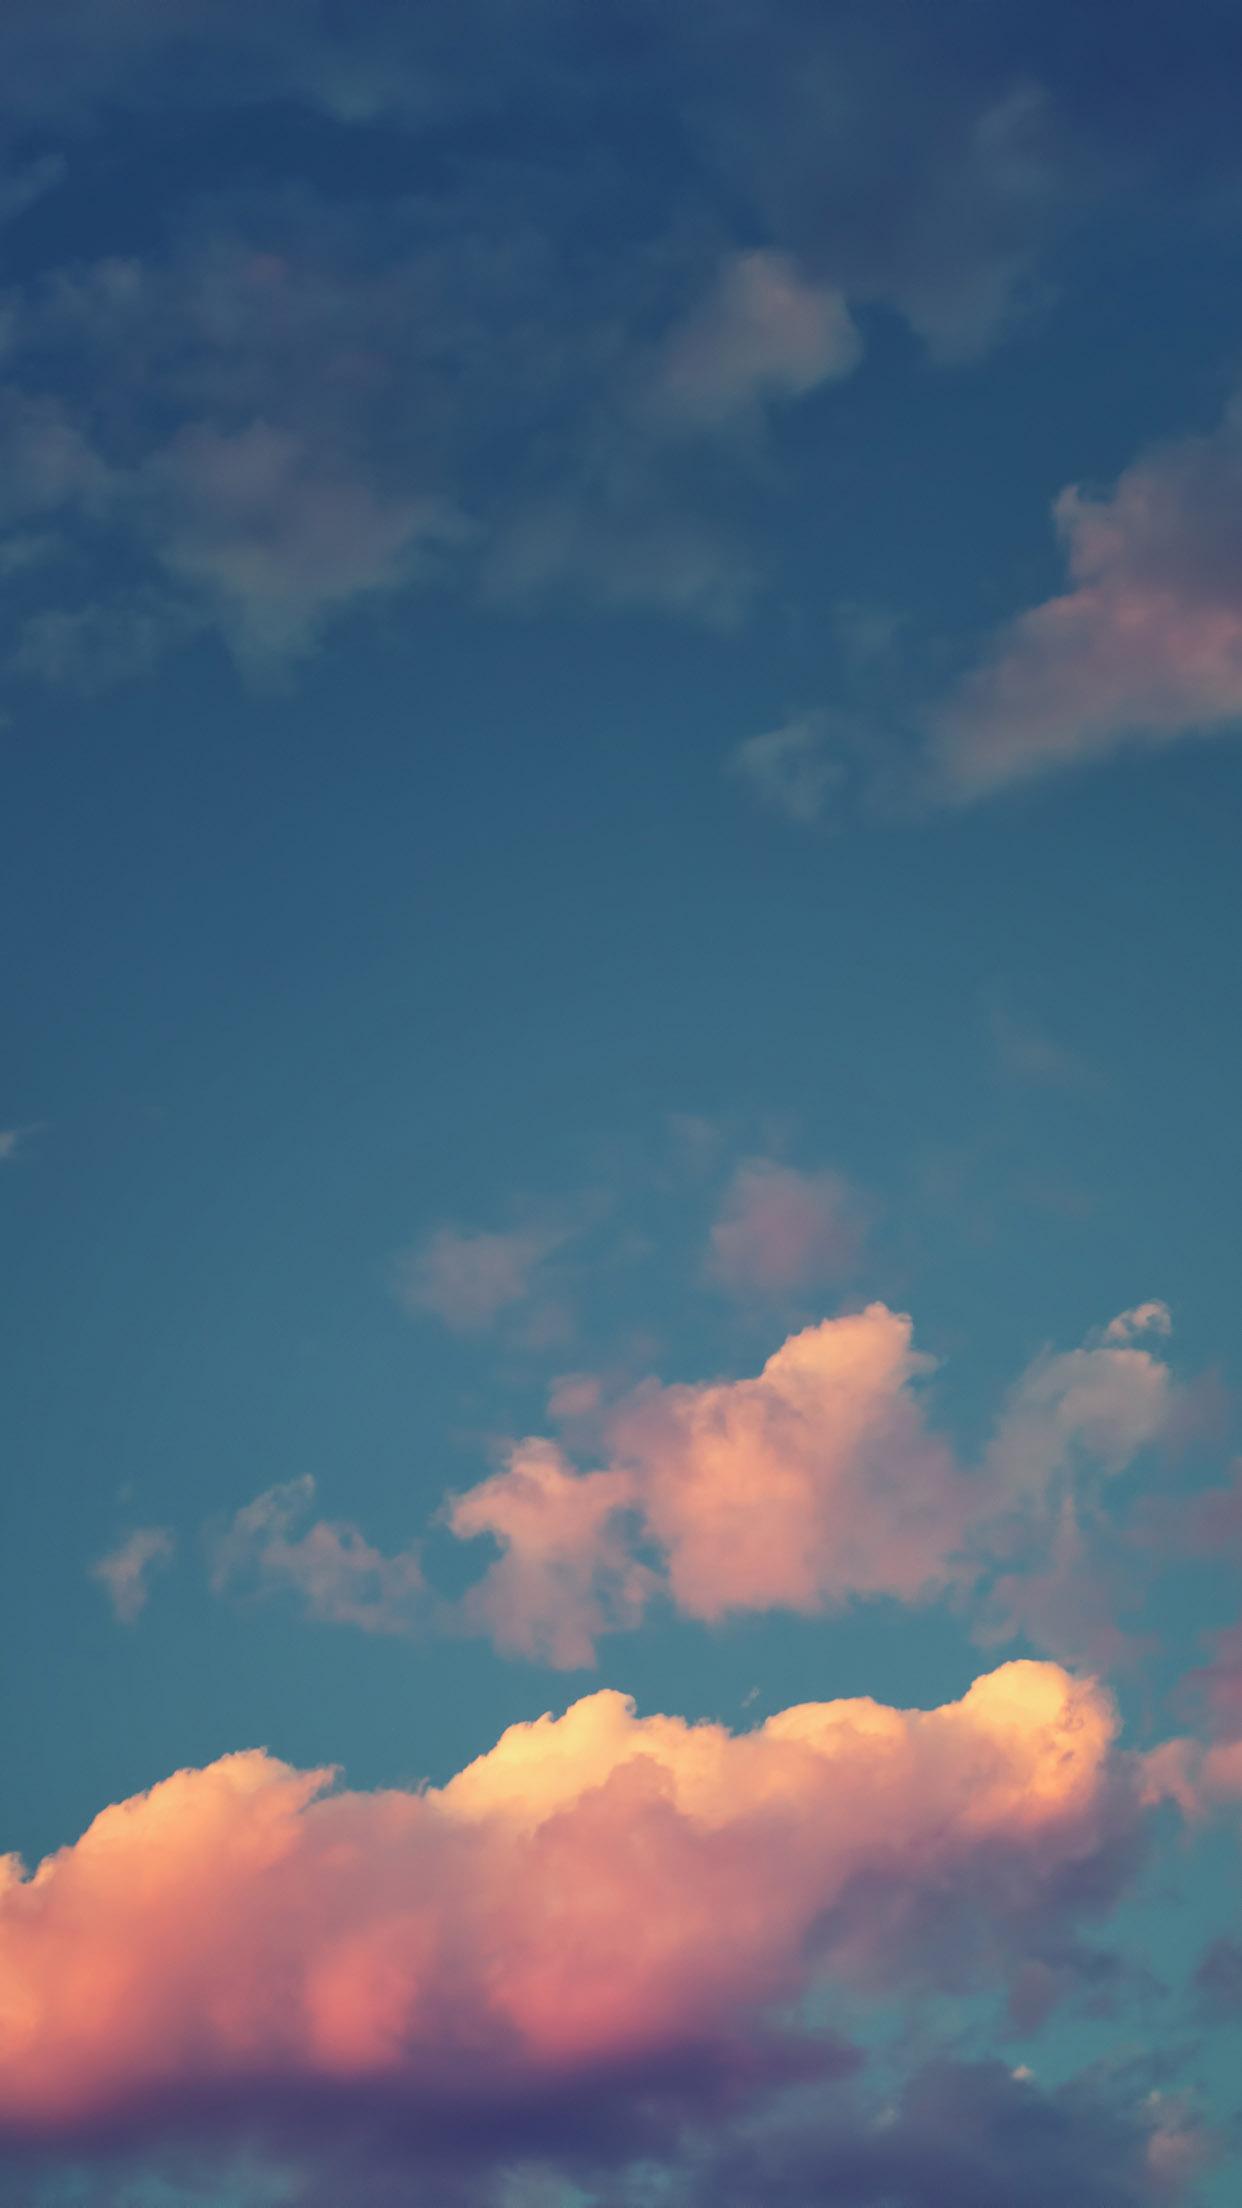 Wallpaper de nubes para iPhone 6 Plus 1242x2208